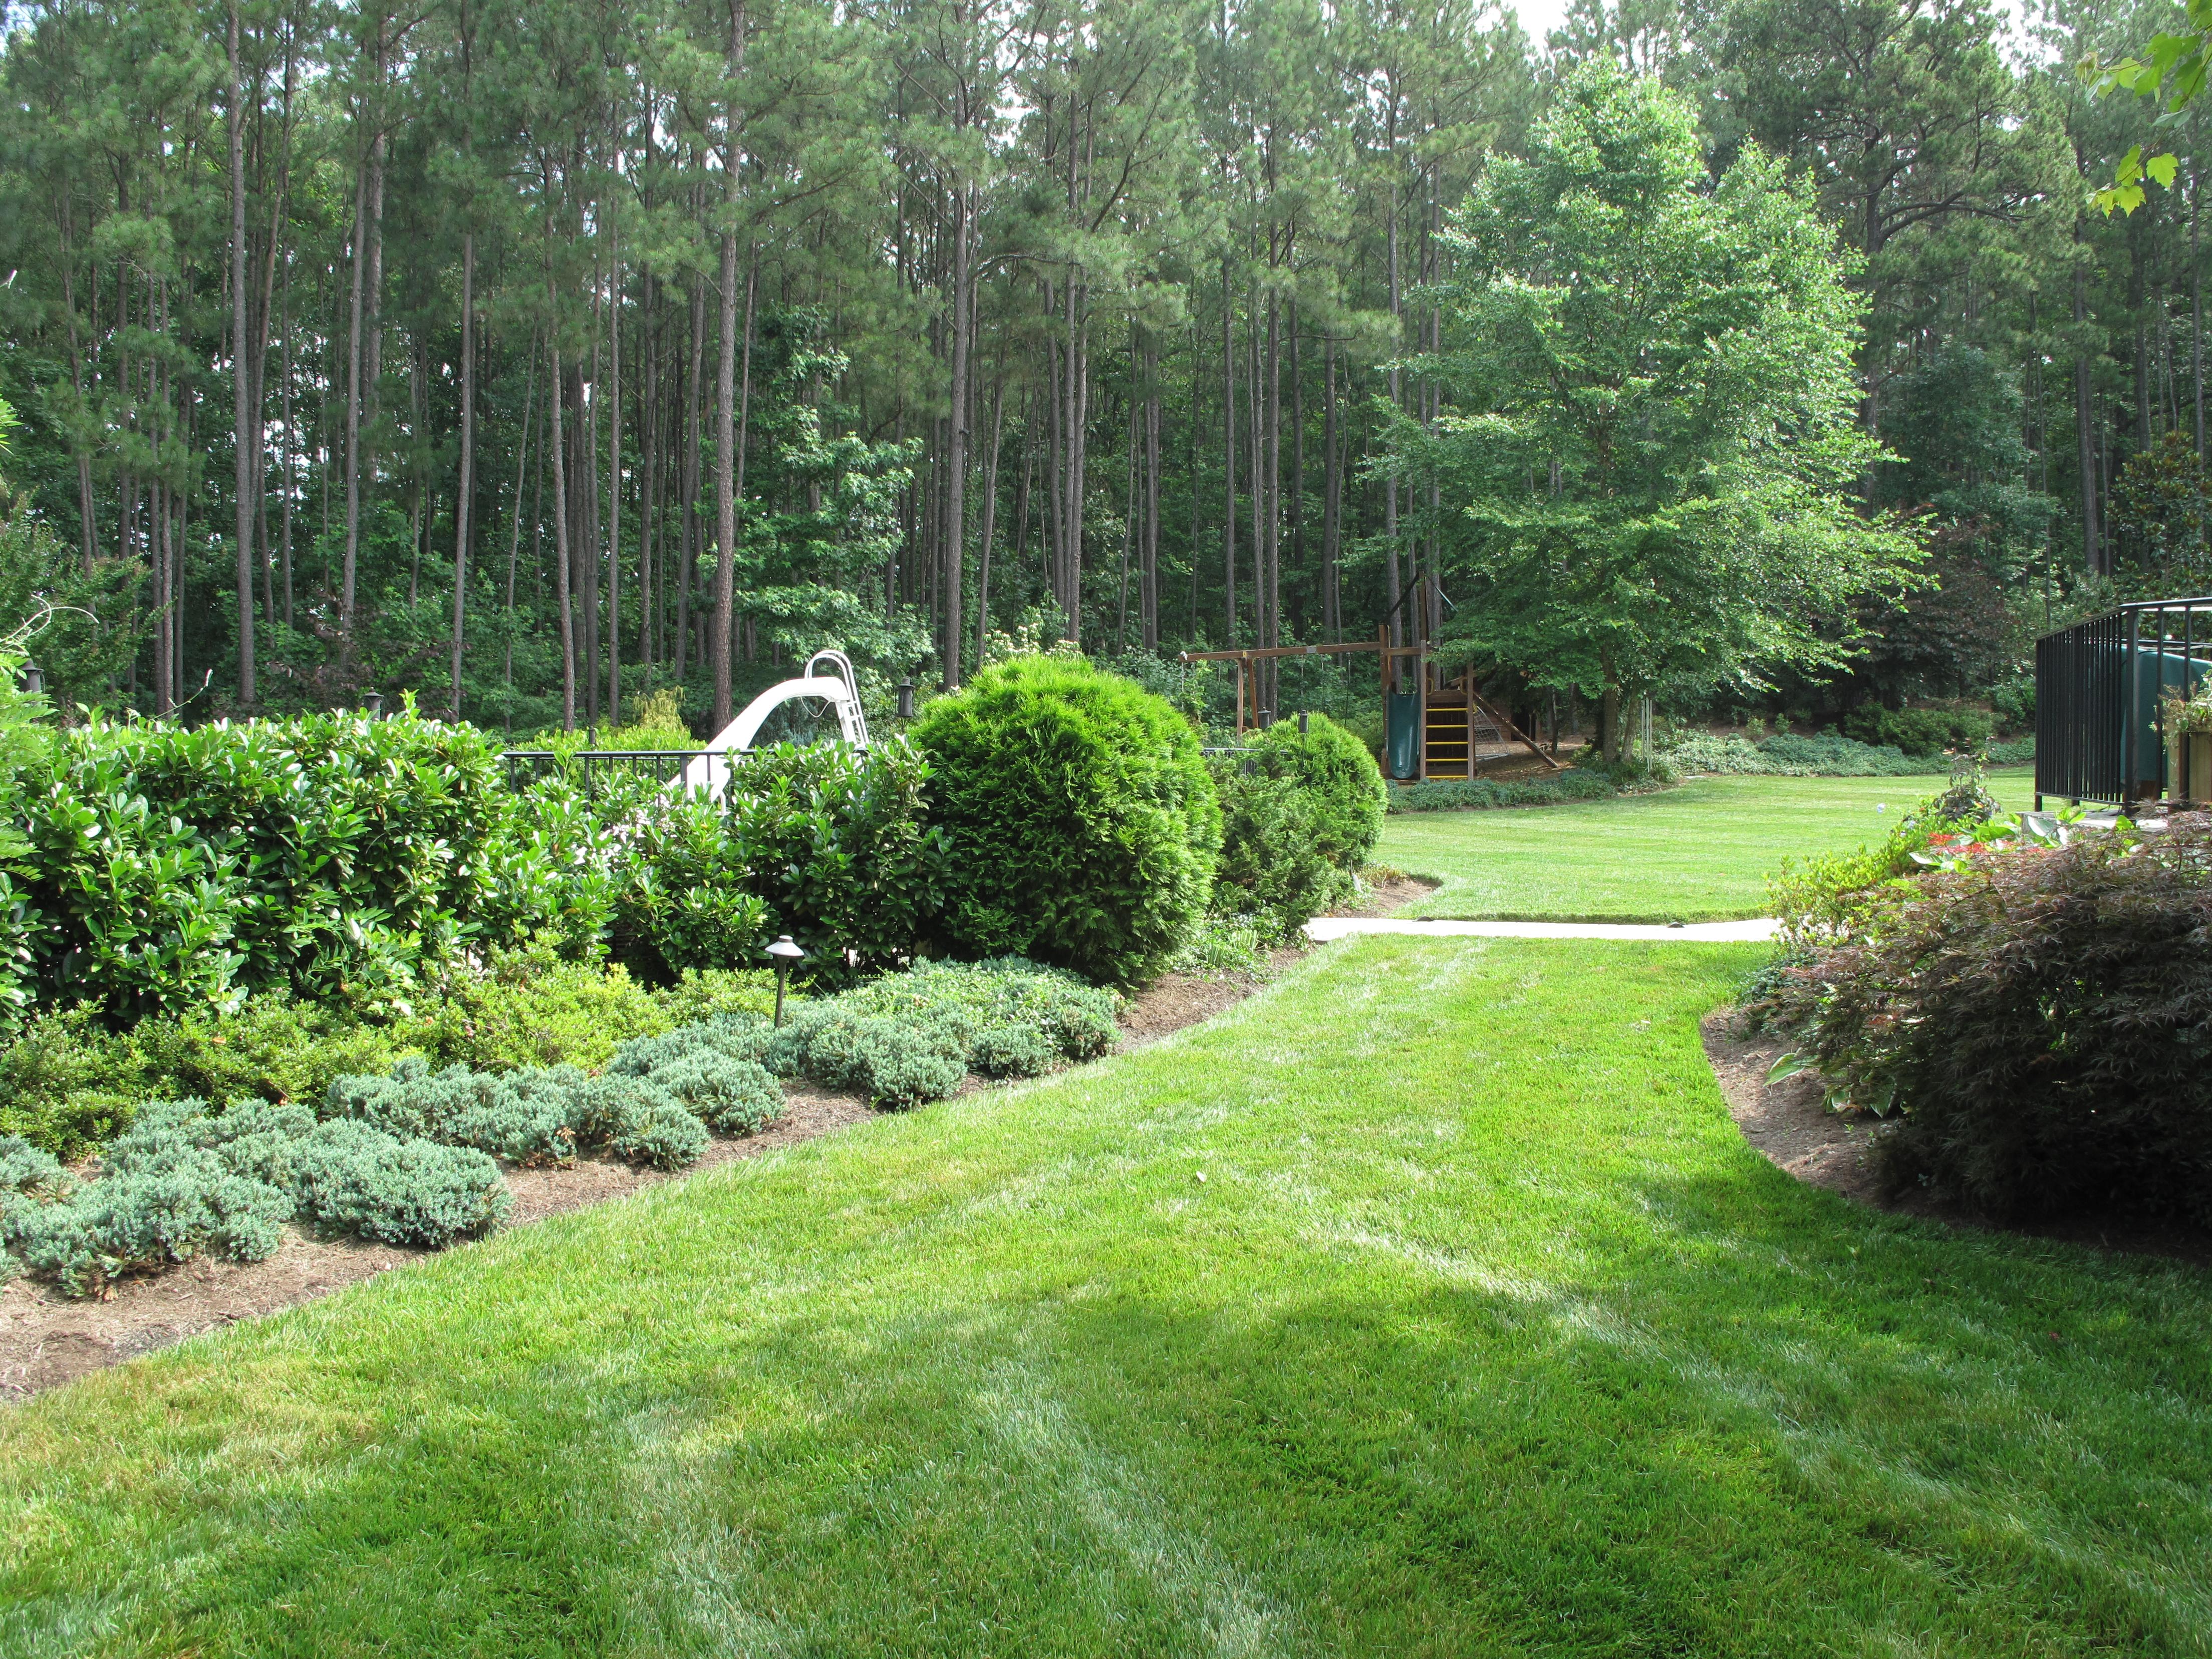 Grass Cutting - Weekly